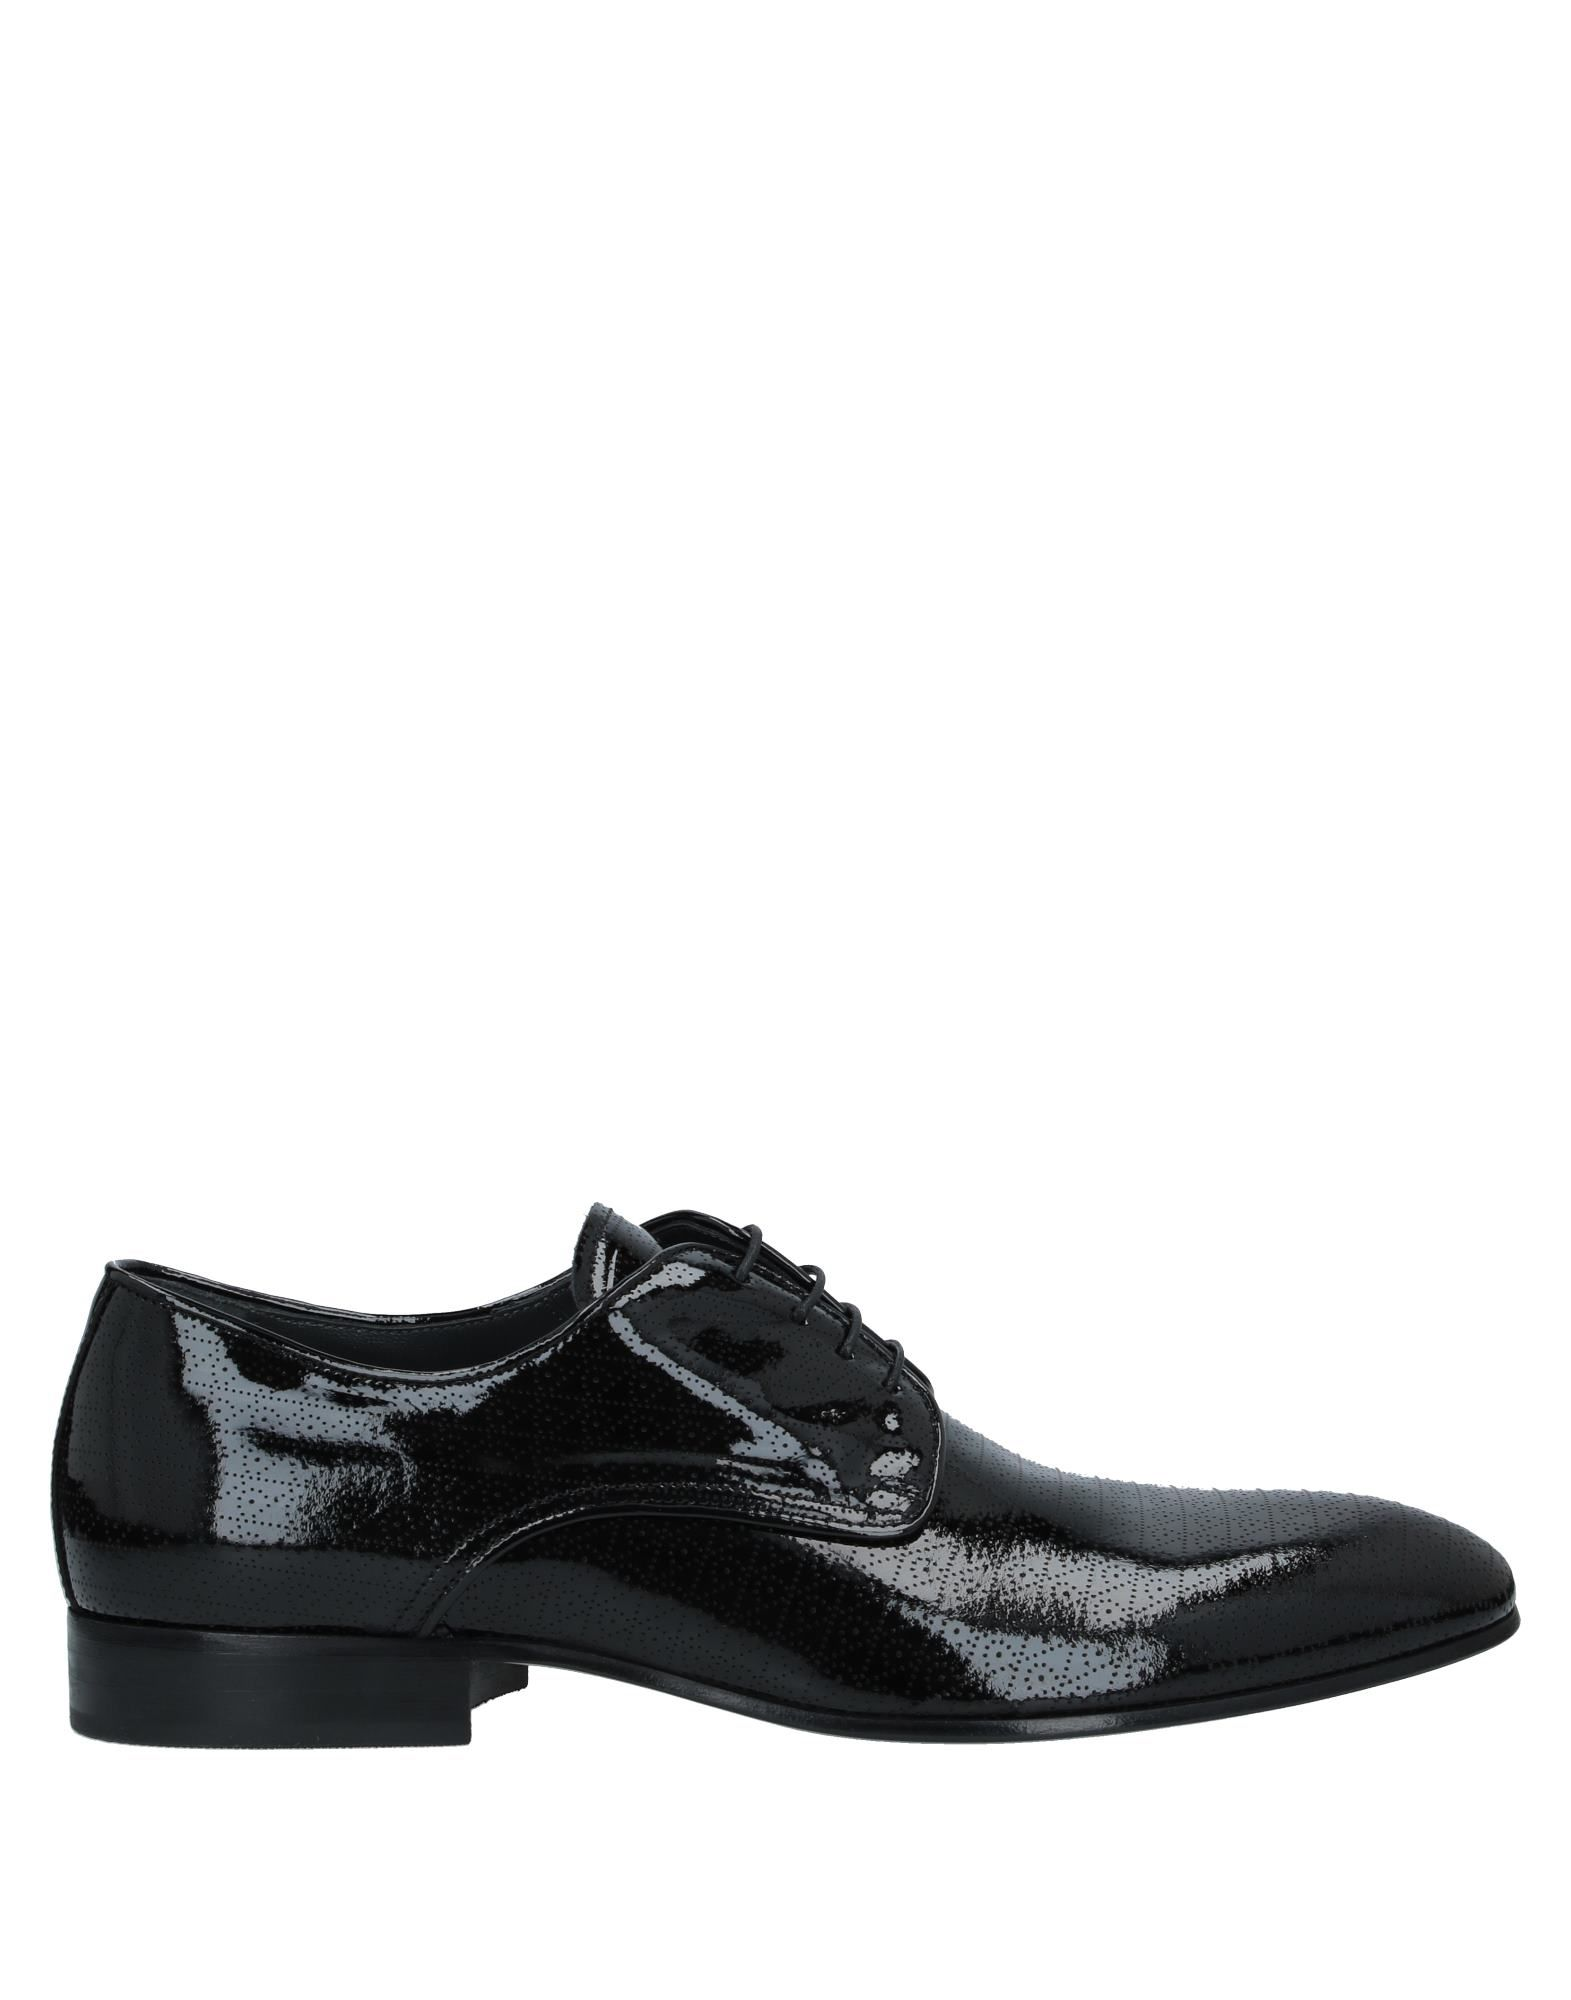 GIOVANNI CONTI Обувь на шнурках giovanni conti обувь на шнурках